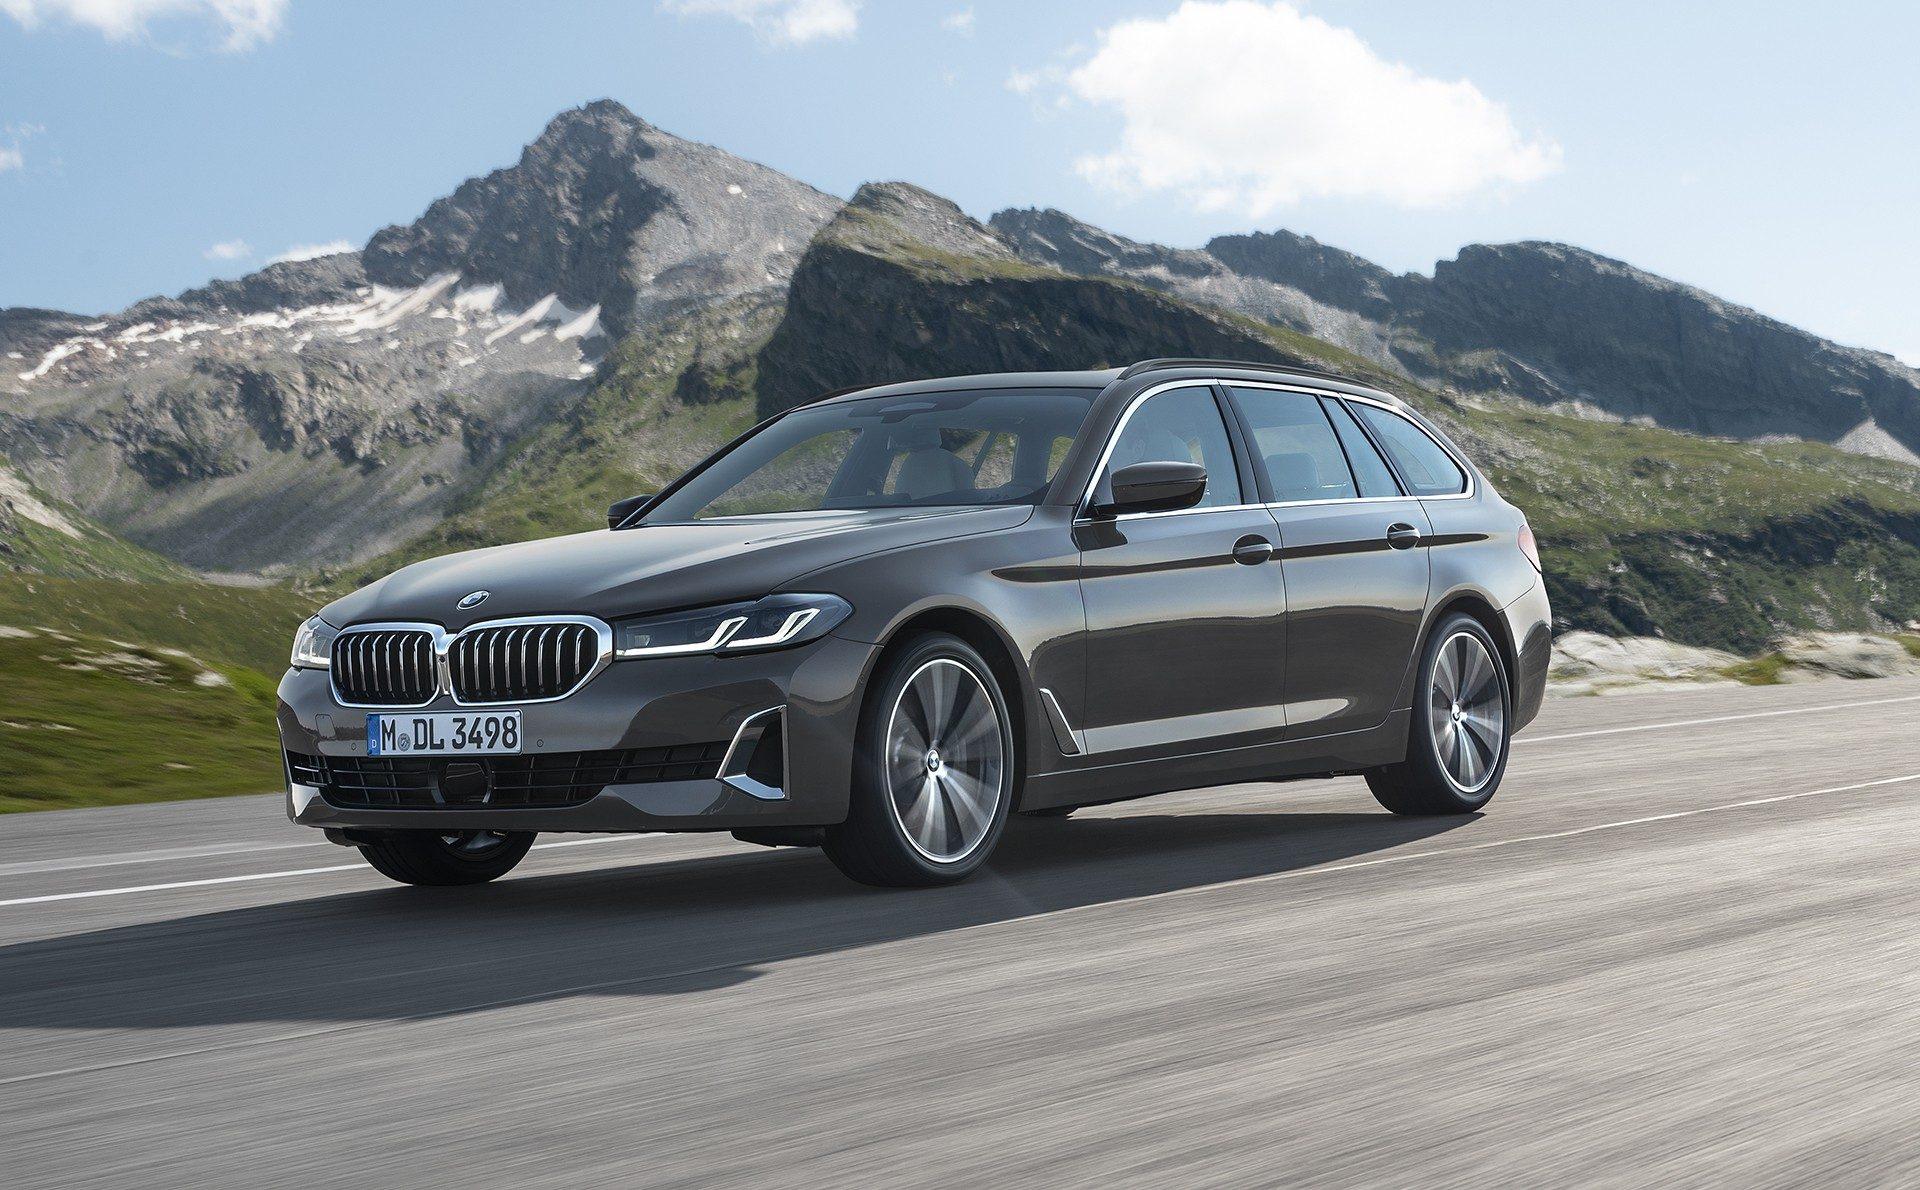 BMW serii 5 Touring G30 2021 (lifting)